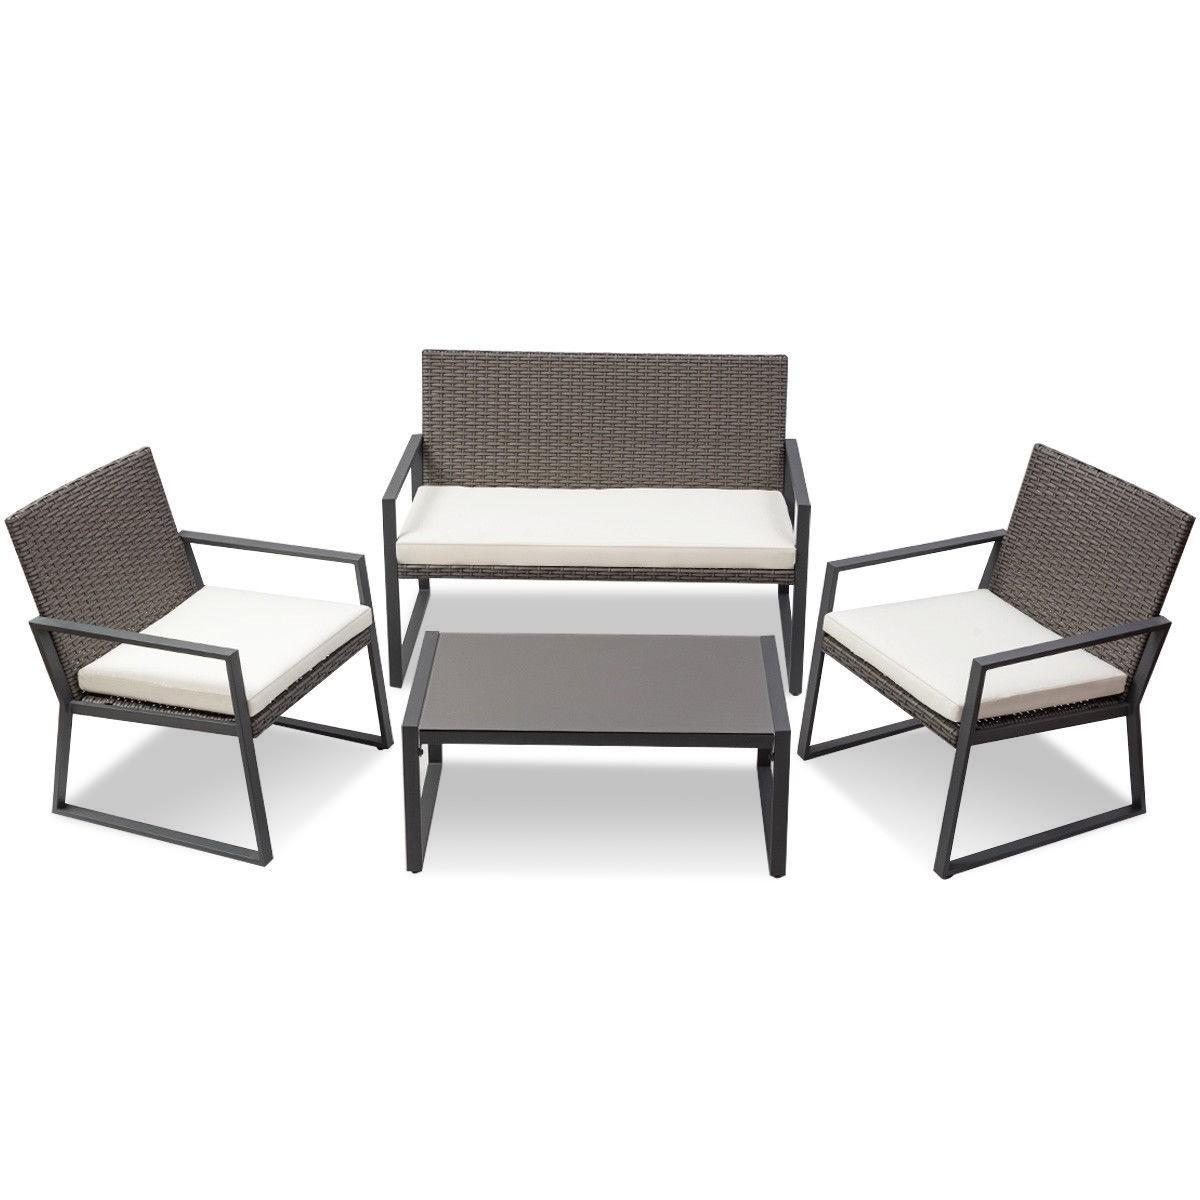 4 pcs Patio Rattan Wicker Cushioned Seat Sofa Furniture Set by